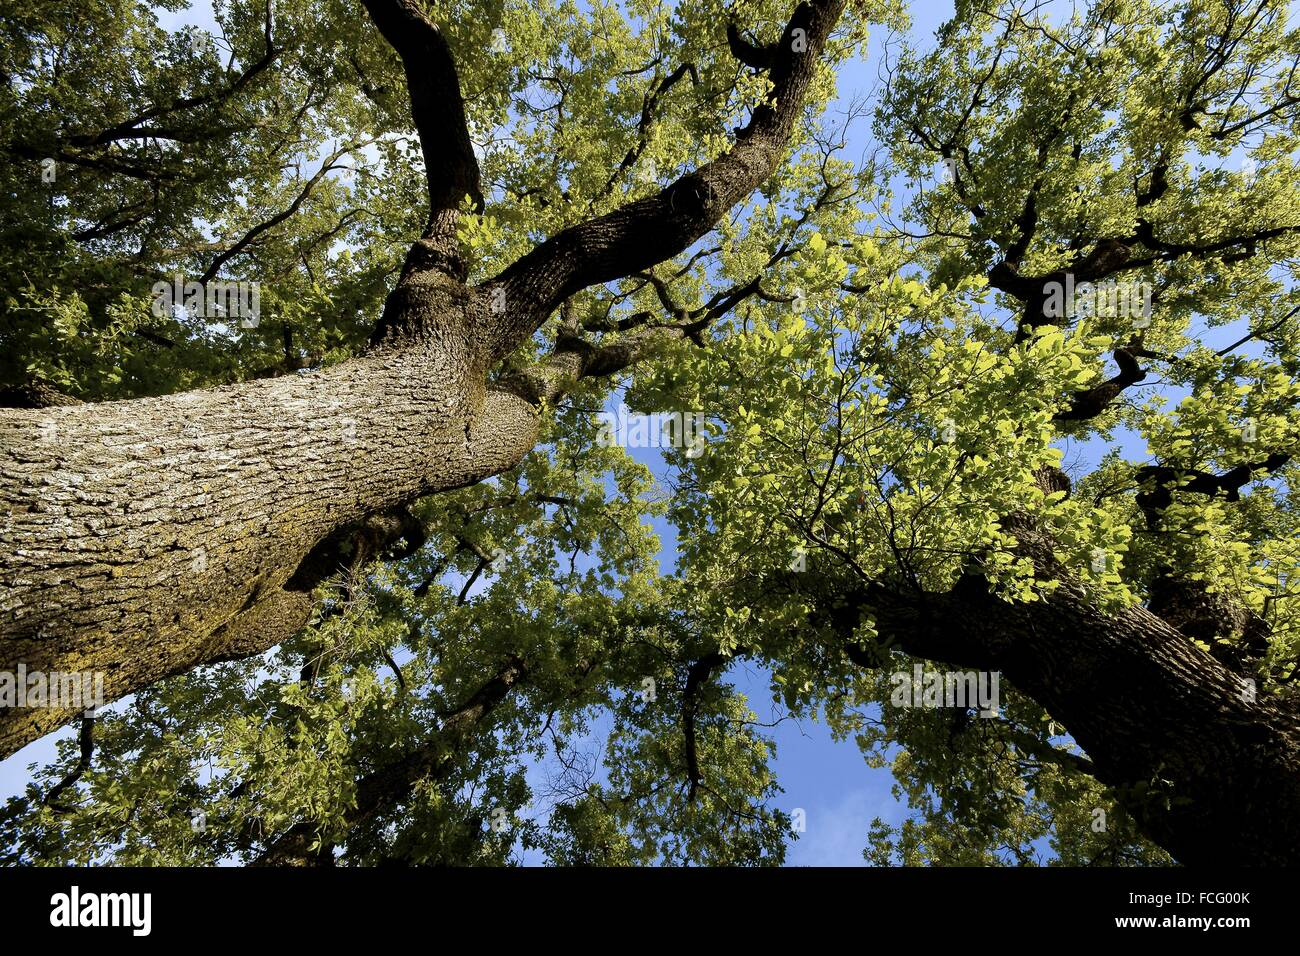 Oak (Quercus robur), Isábena river valley, Huesca province, Aragon, Spain - Stock Image